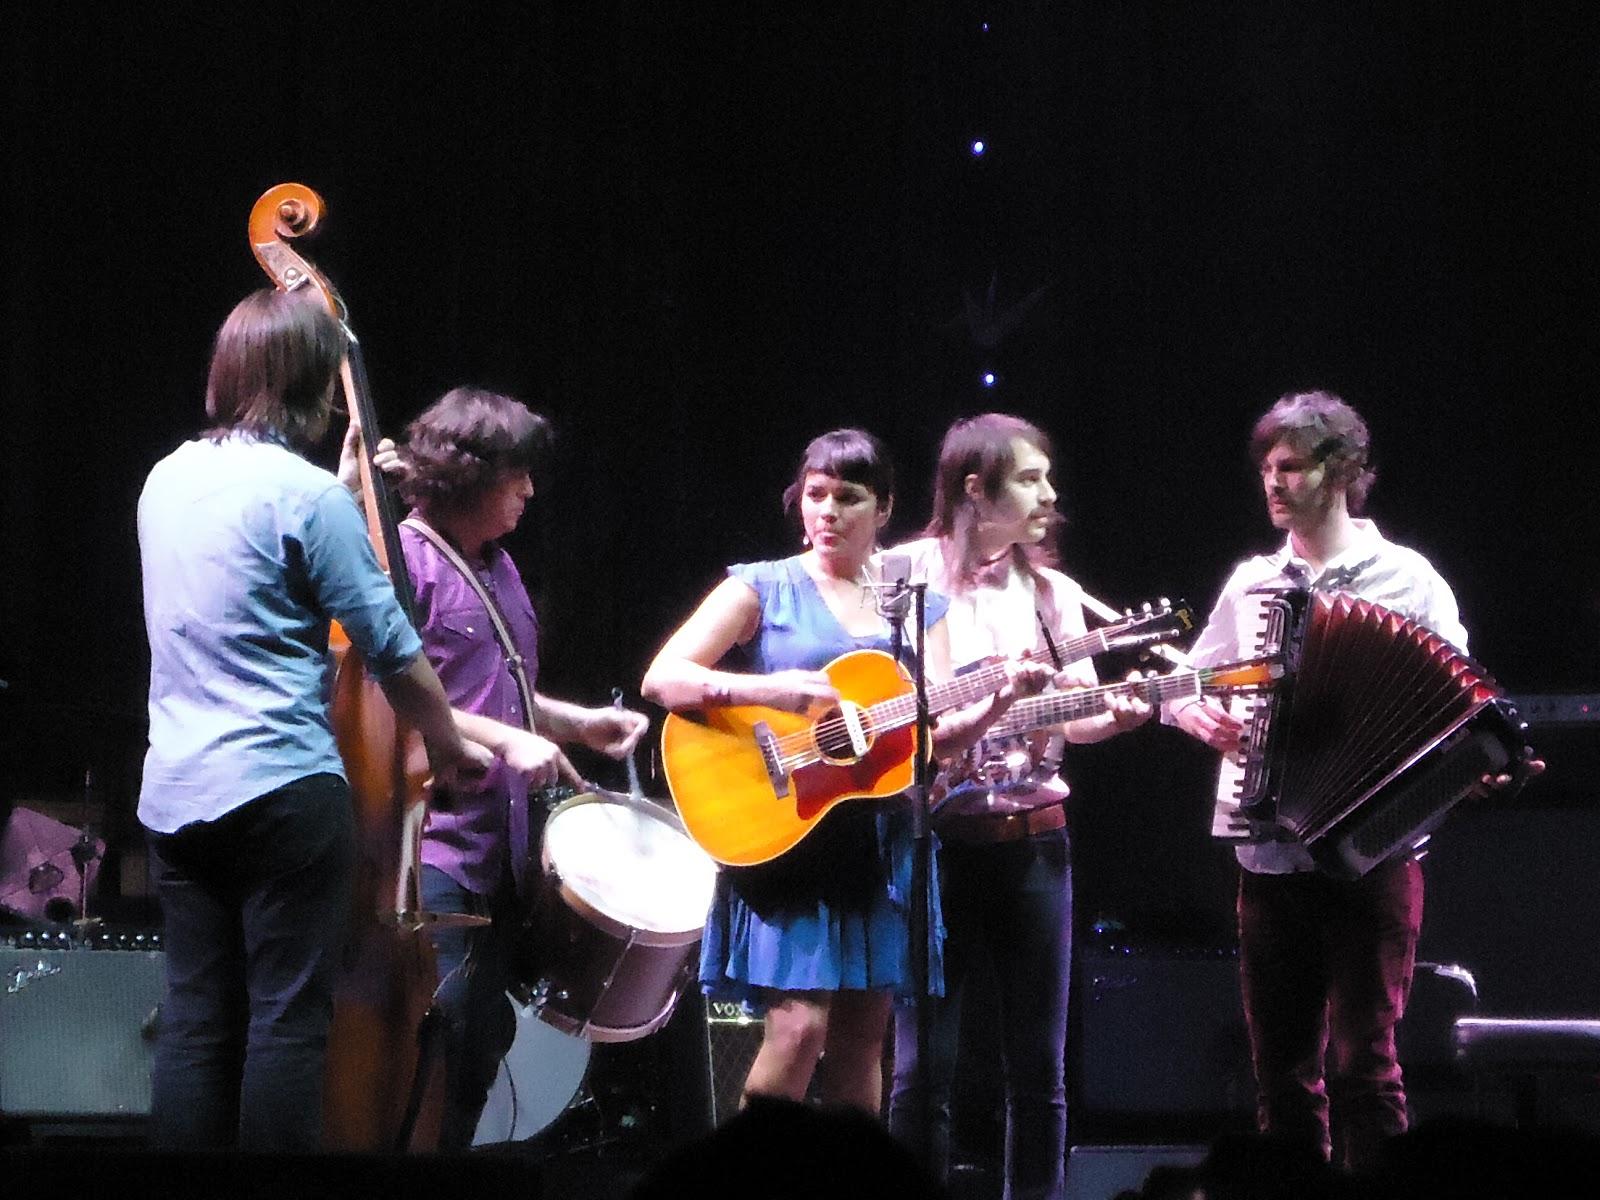 http://1.bp.blogspot.com/-ZgVlAo7Nl6s/UMUu036Q0cI/AAAAAAAAFT8/gj-pXR0yIfY/s1600/Norah+Jones+en+el+Luna+Park.JPG